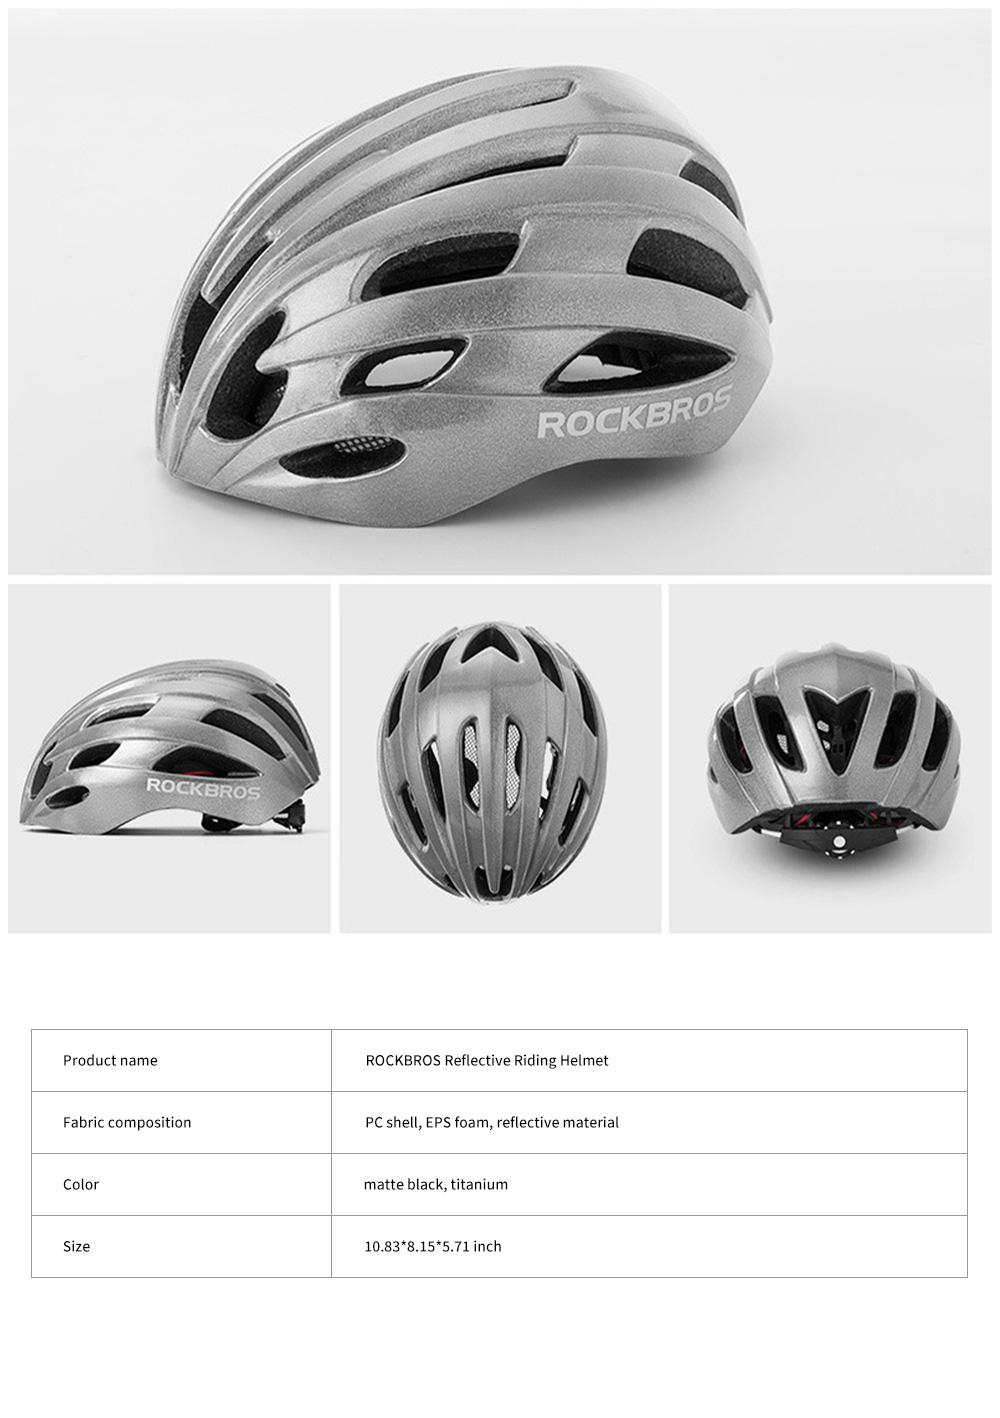 ROCKBROS Reflective Riding Helmet Warning Bicycle Helmet for Night Riding Integrated Helmet Men Riding Helmet for Mountain Road 17